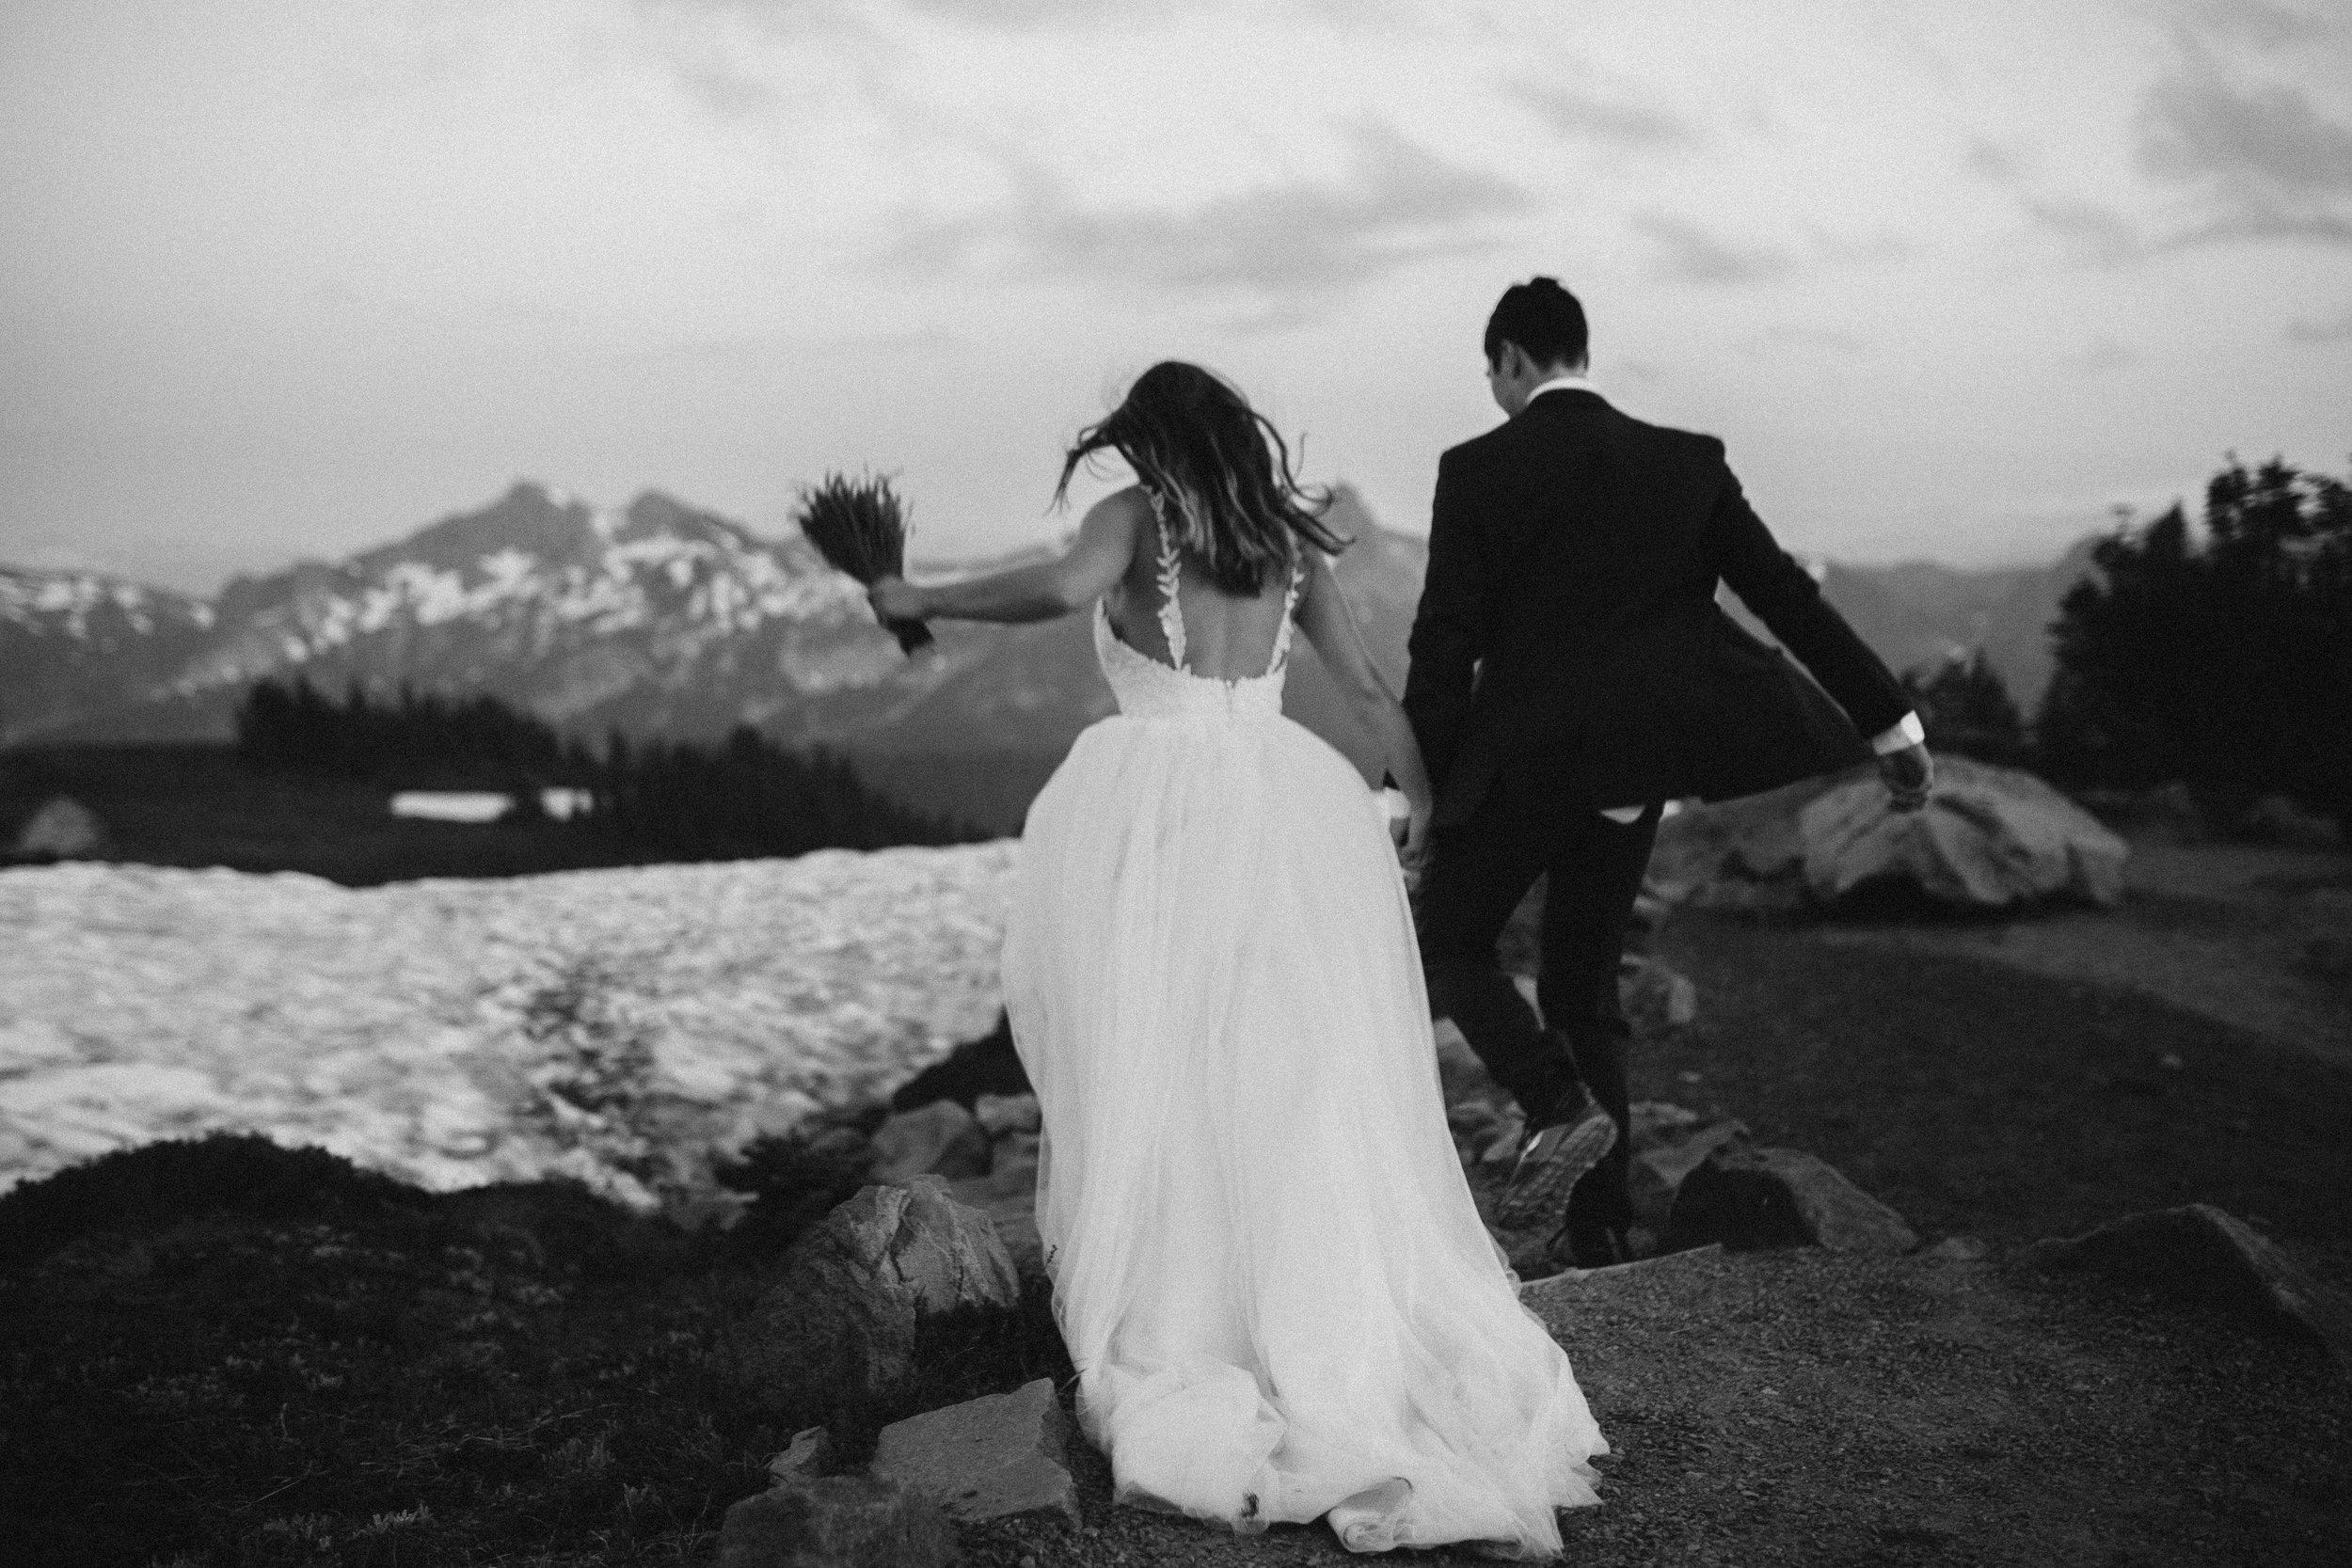 Nicole-Daacke-Photography-Mt-Rainier-elopement-photographer-washington-mountain-epic-wedding-photography-wildflowers-at-rainier-pine-tree-cloudy-summer-day-at-mountain-rainier-72.jpg